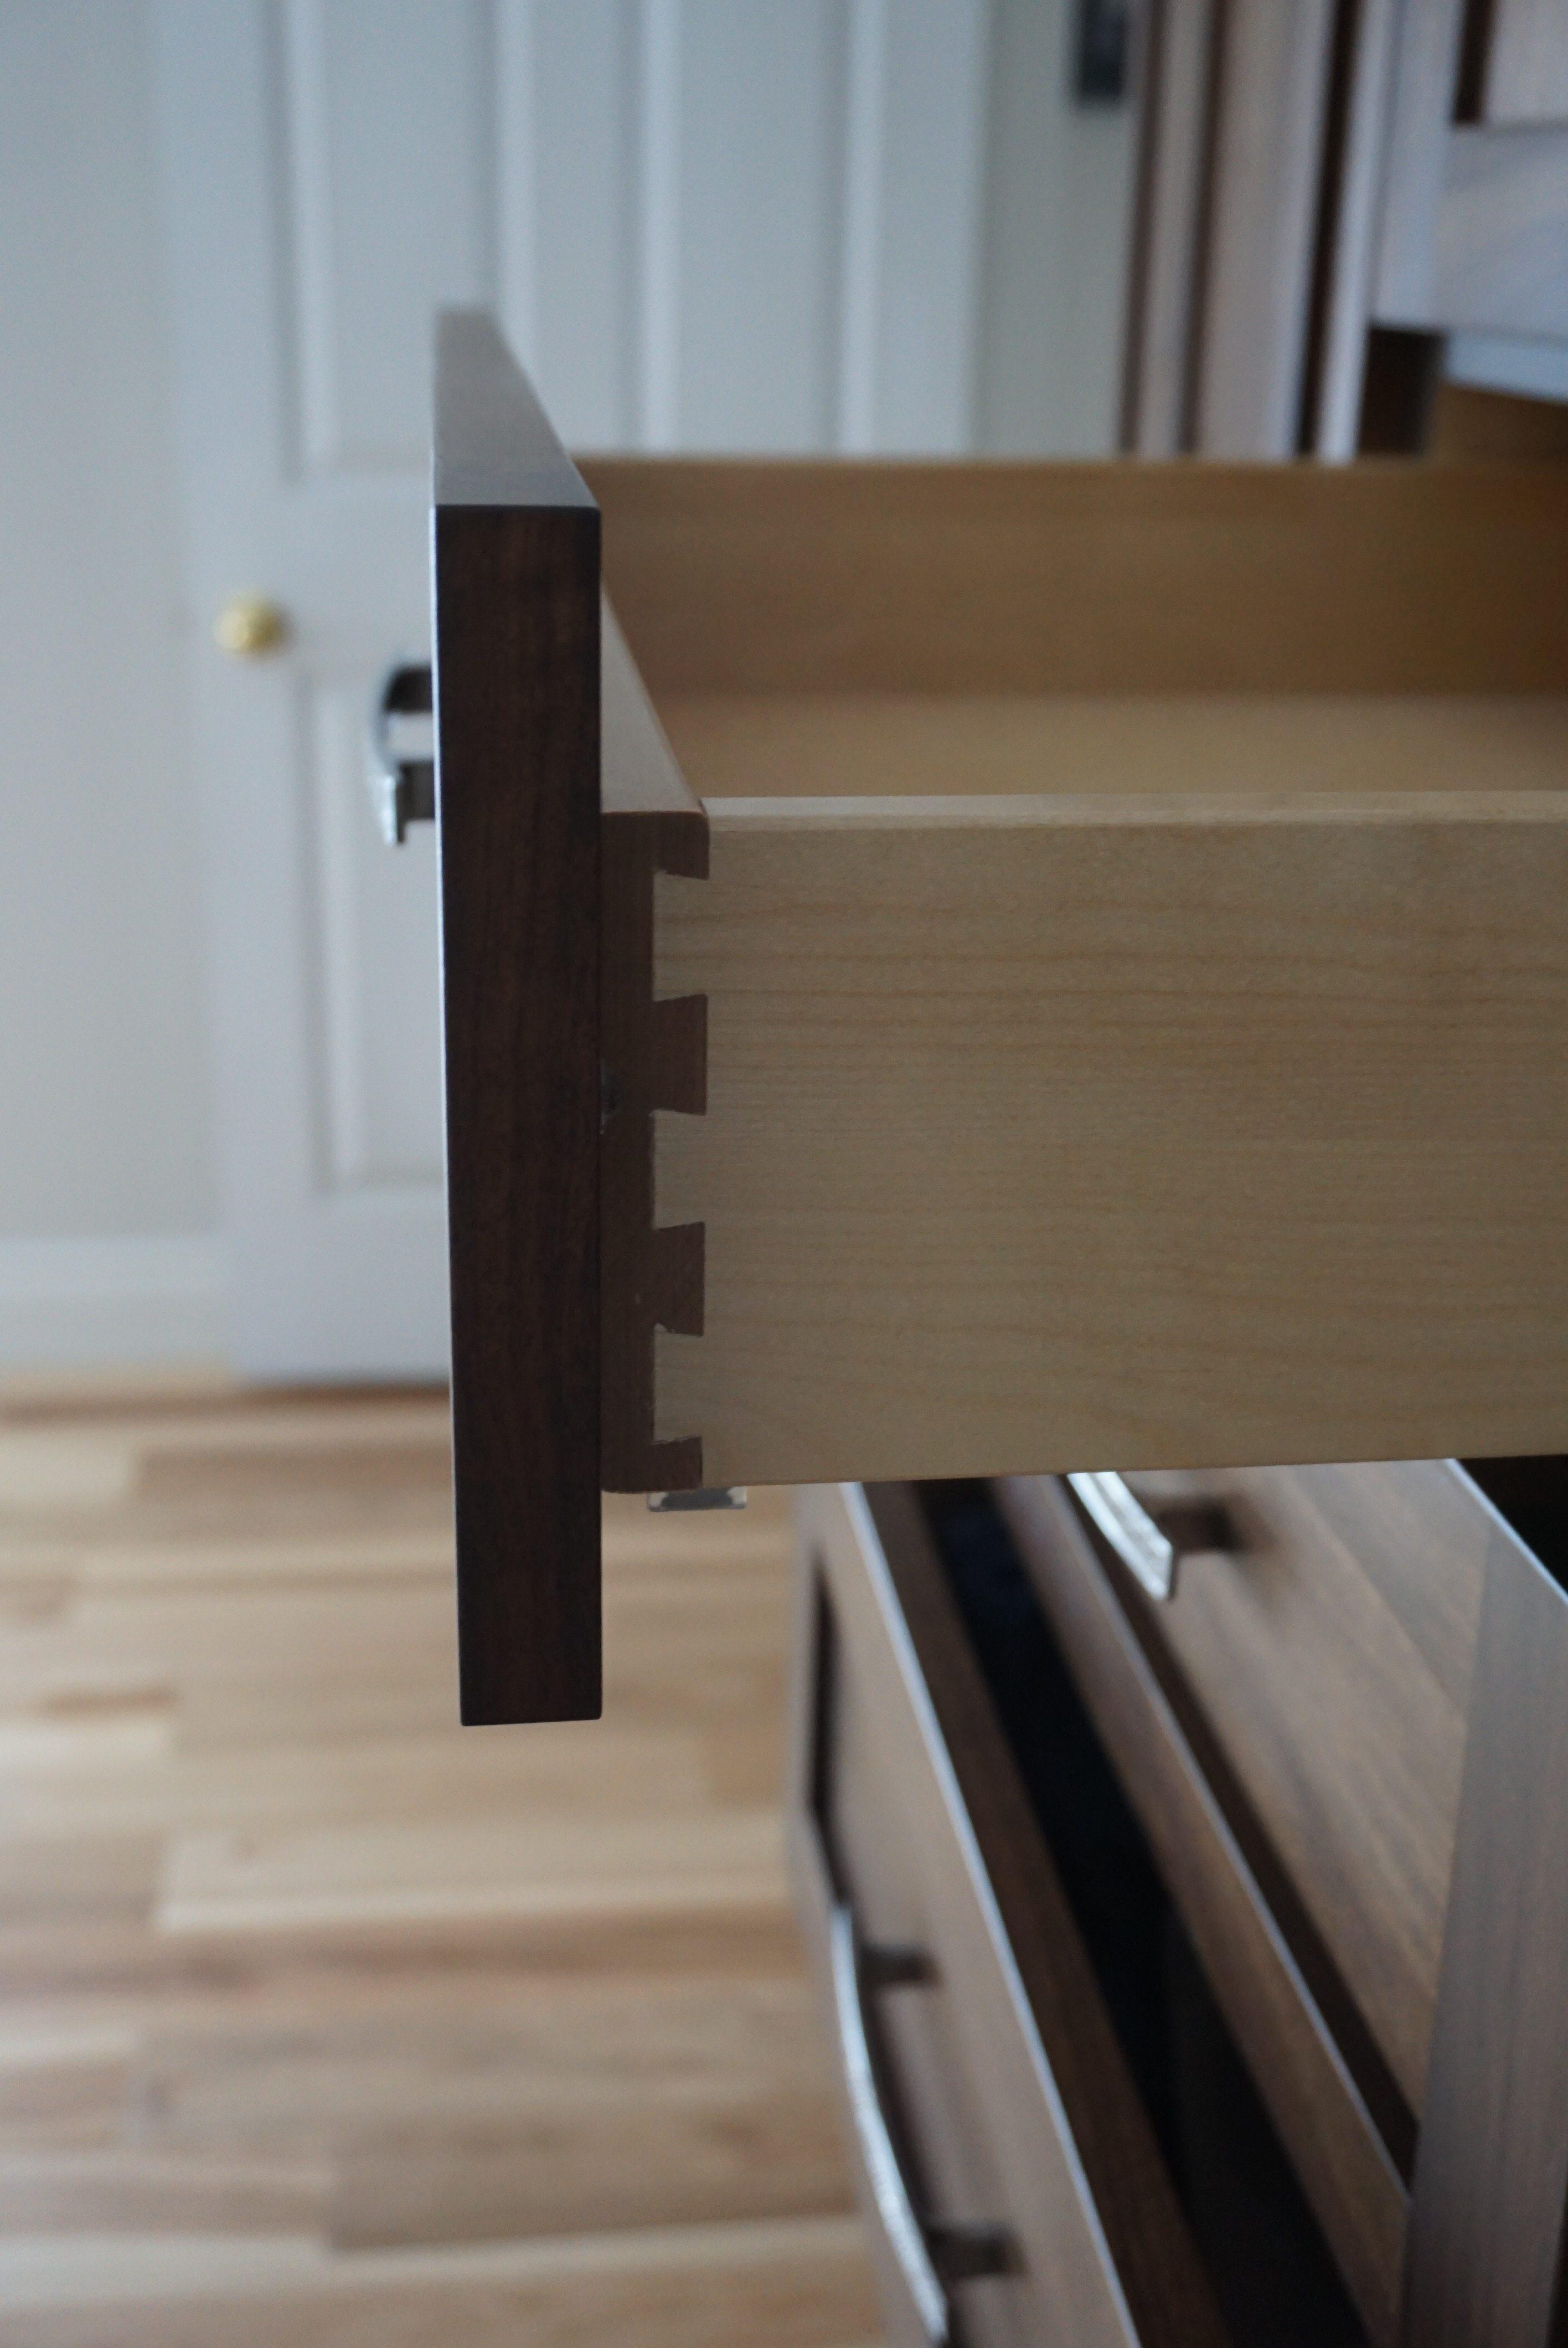 dovetail-drawer-boxes